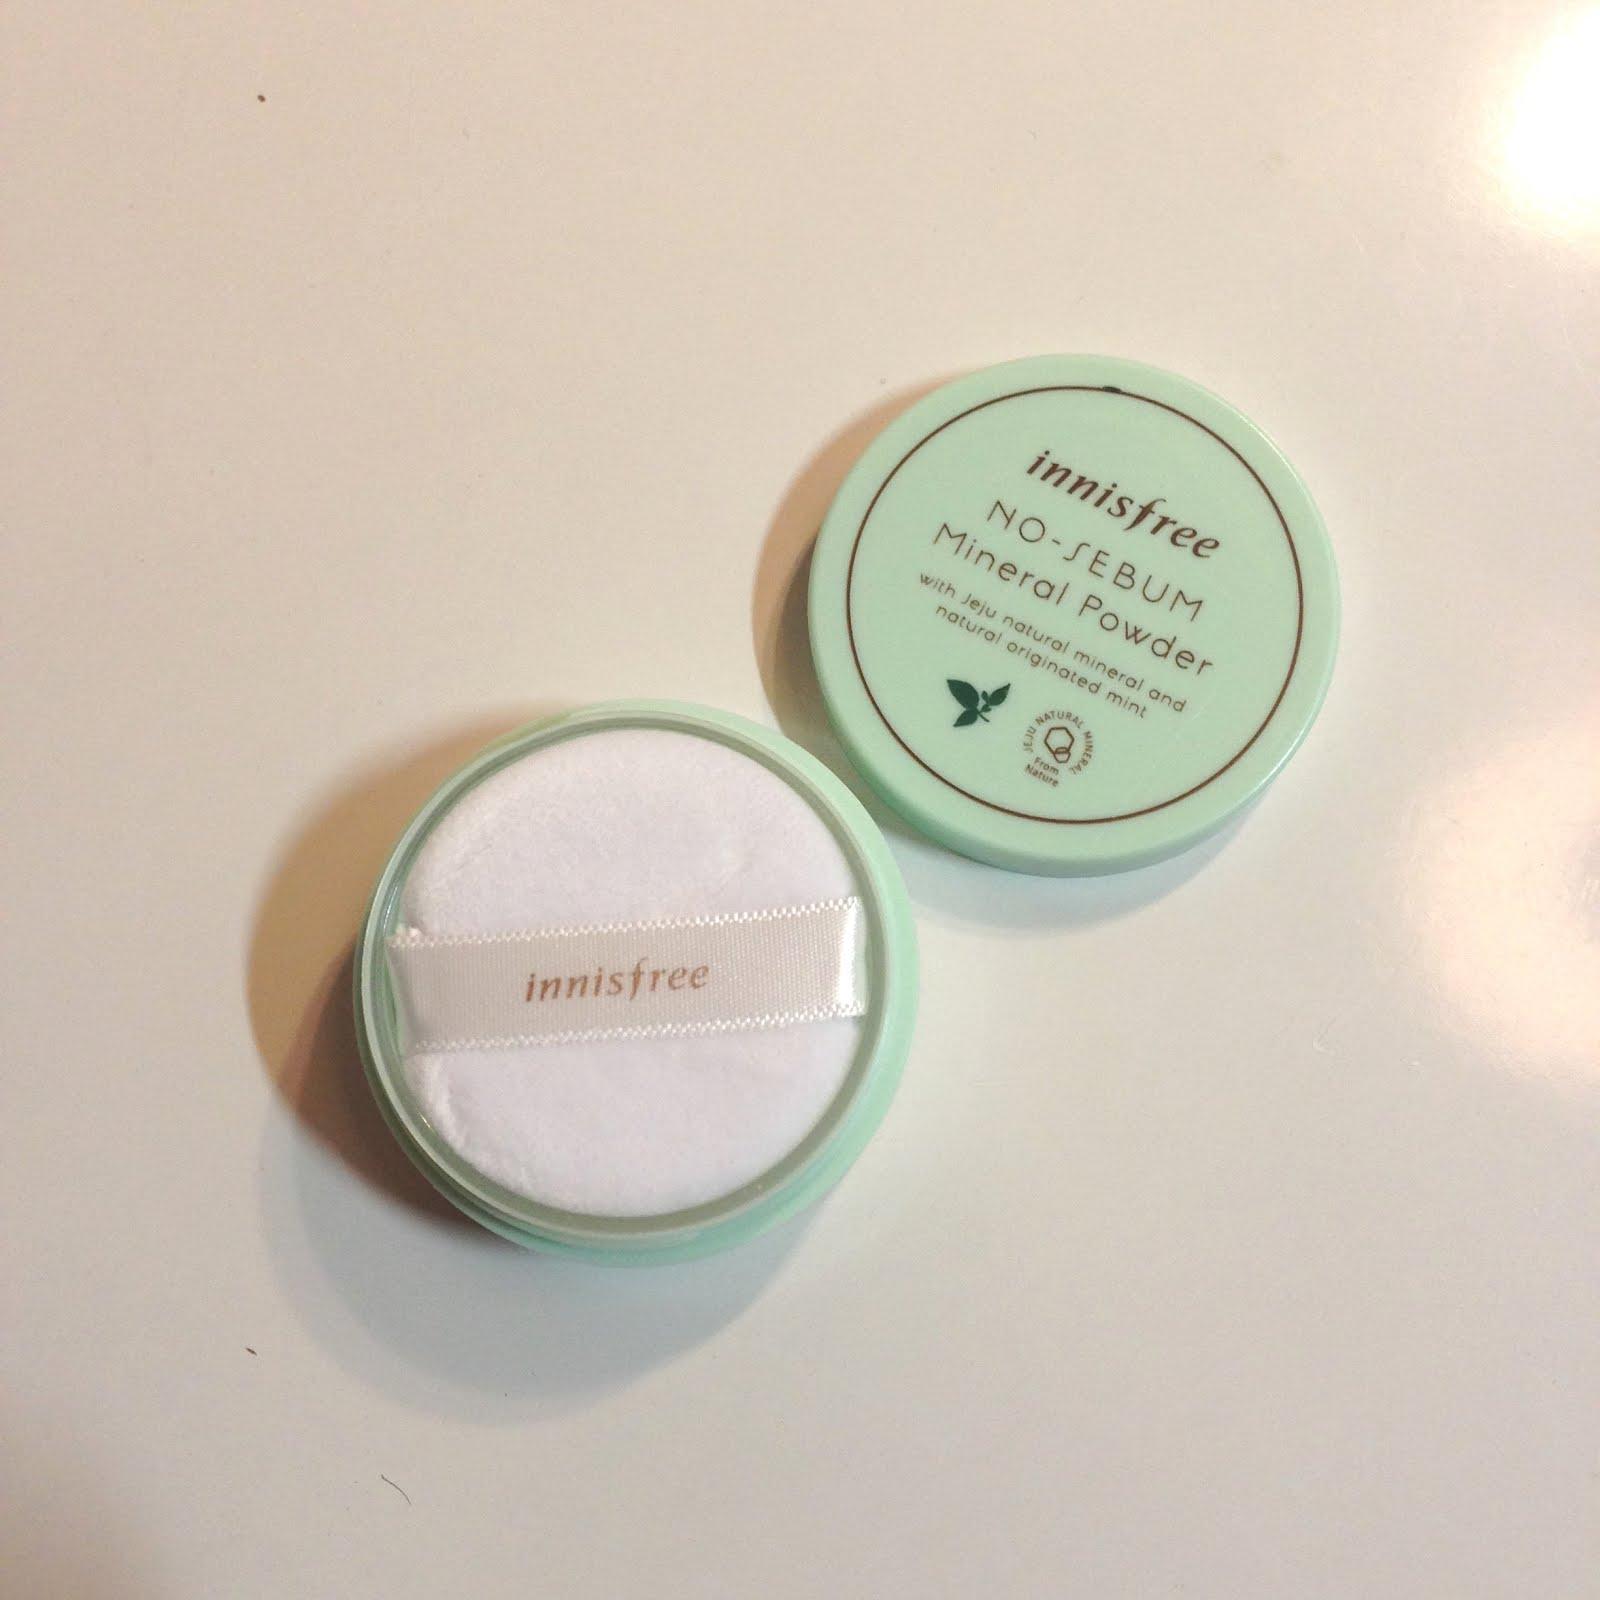 innisfree no sebum mineral powder review